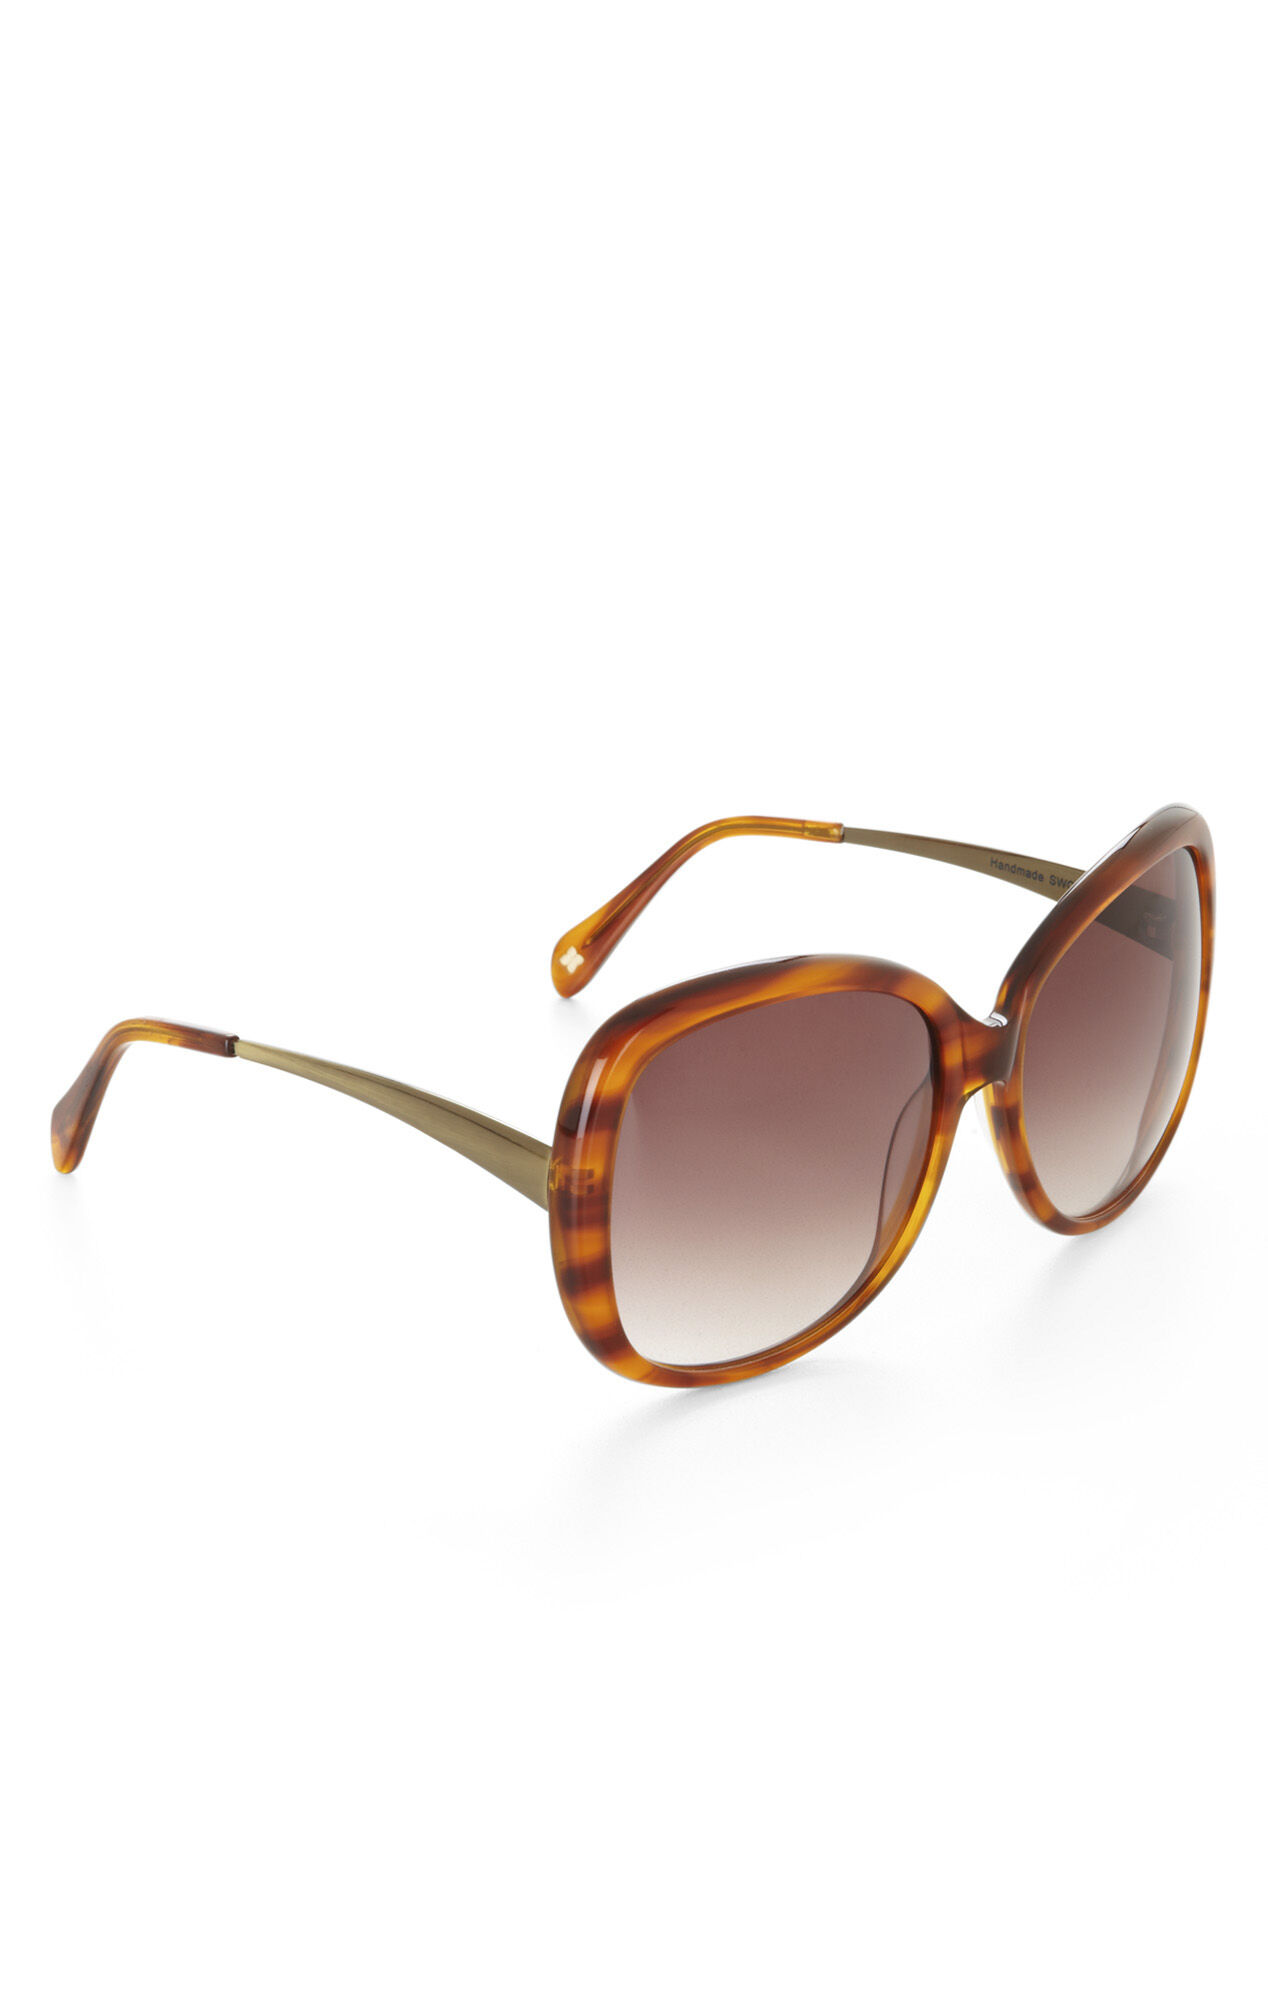 Swoo Oversized Sunglasses